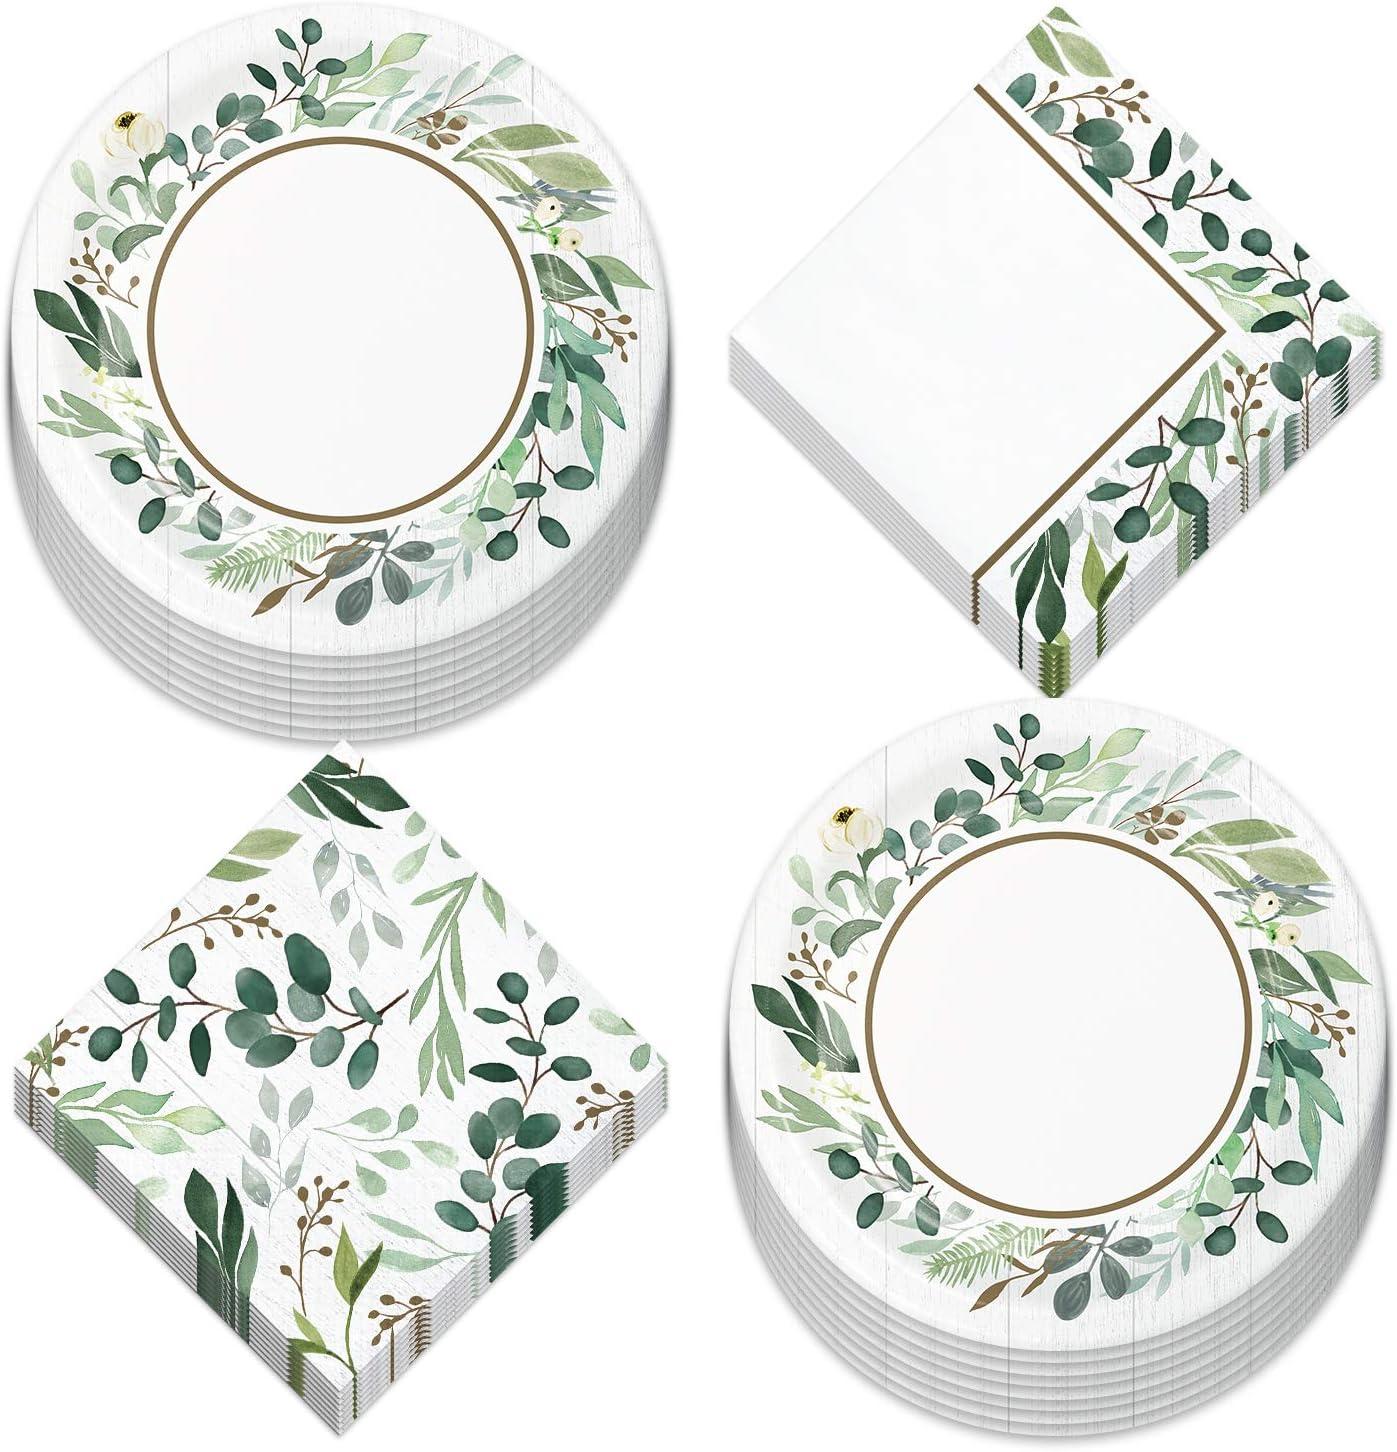 Eucalyptus Greens Garden of Love Bridal Party Supplies - Paper Dessert Plates and Beverage Napkins (Serves 16)